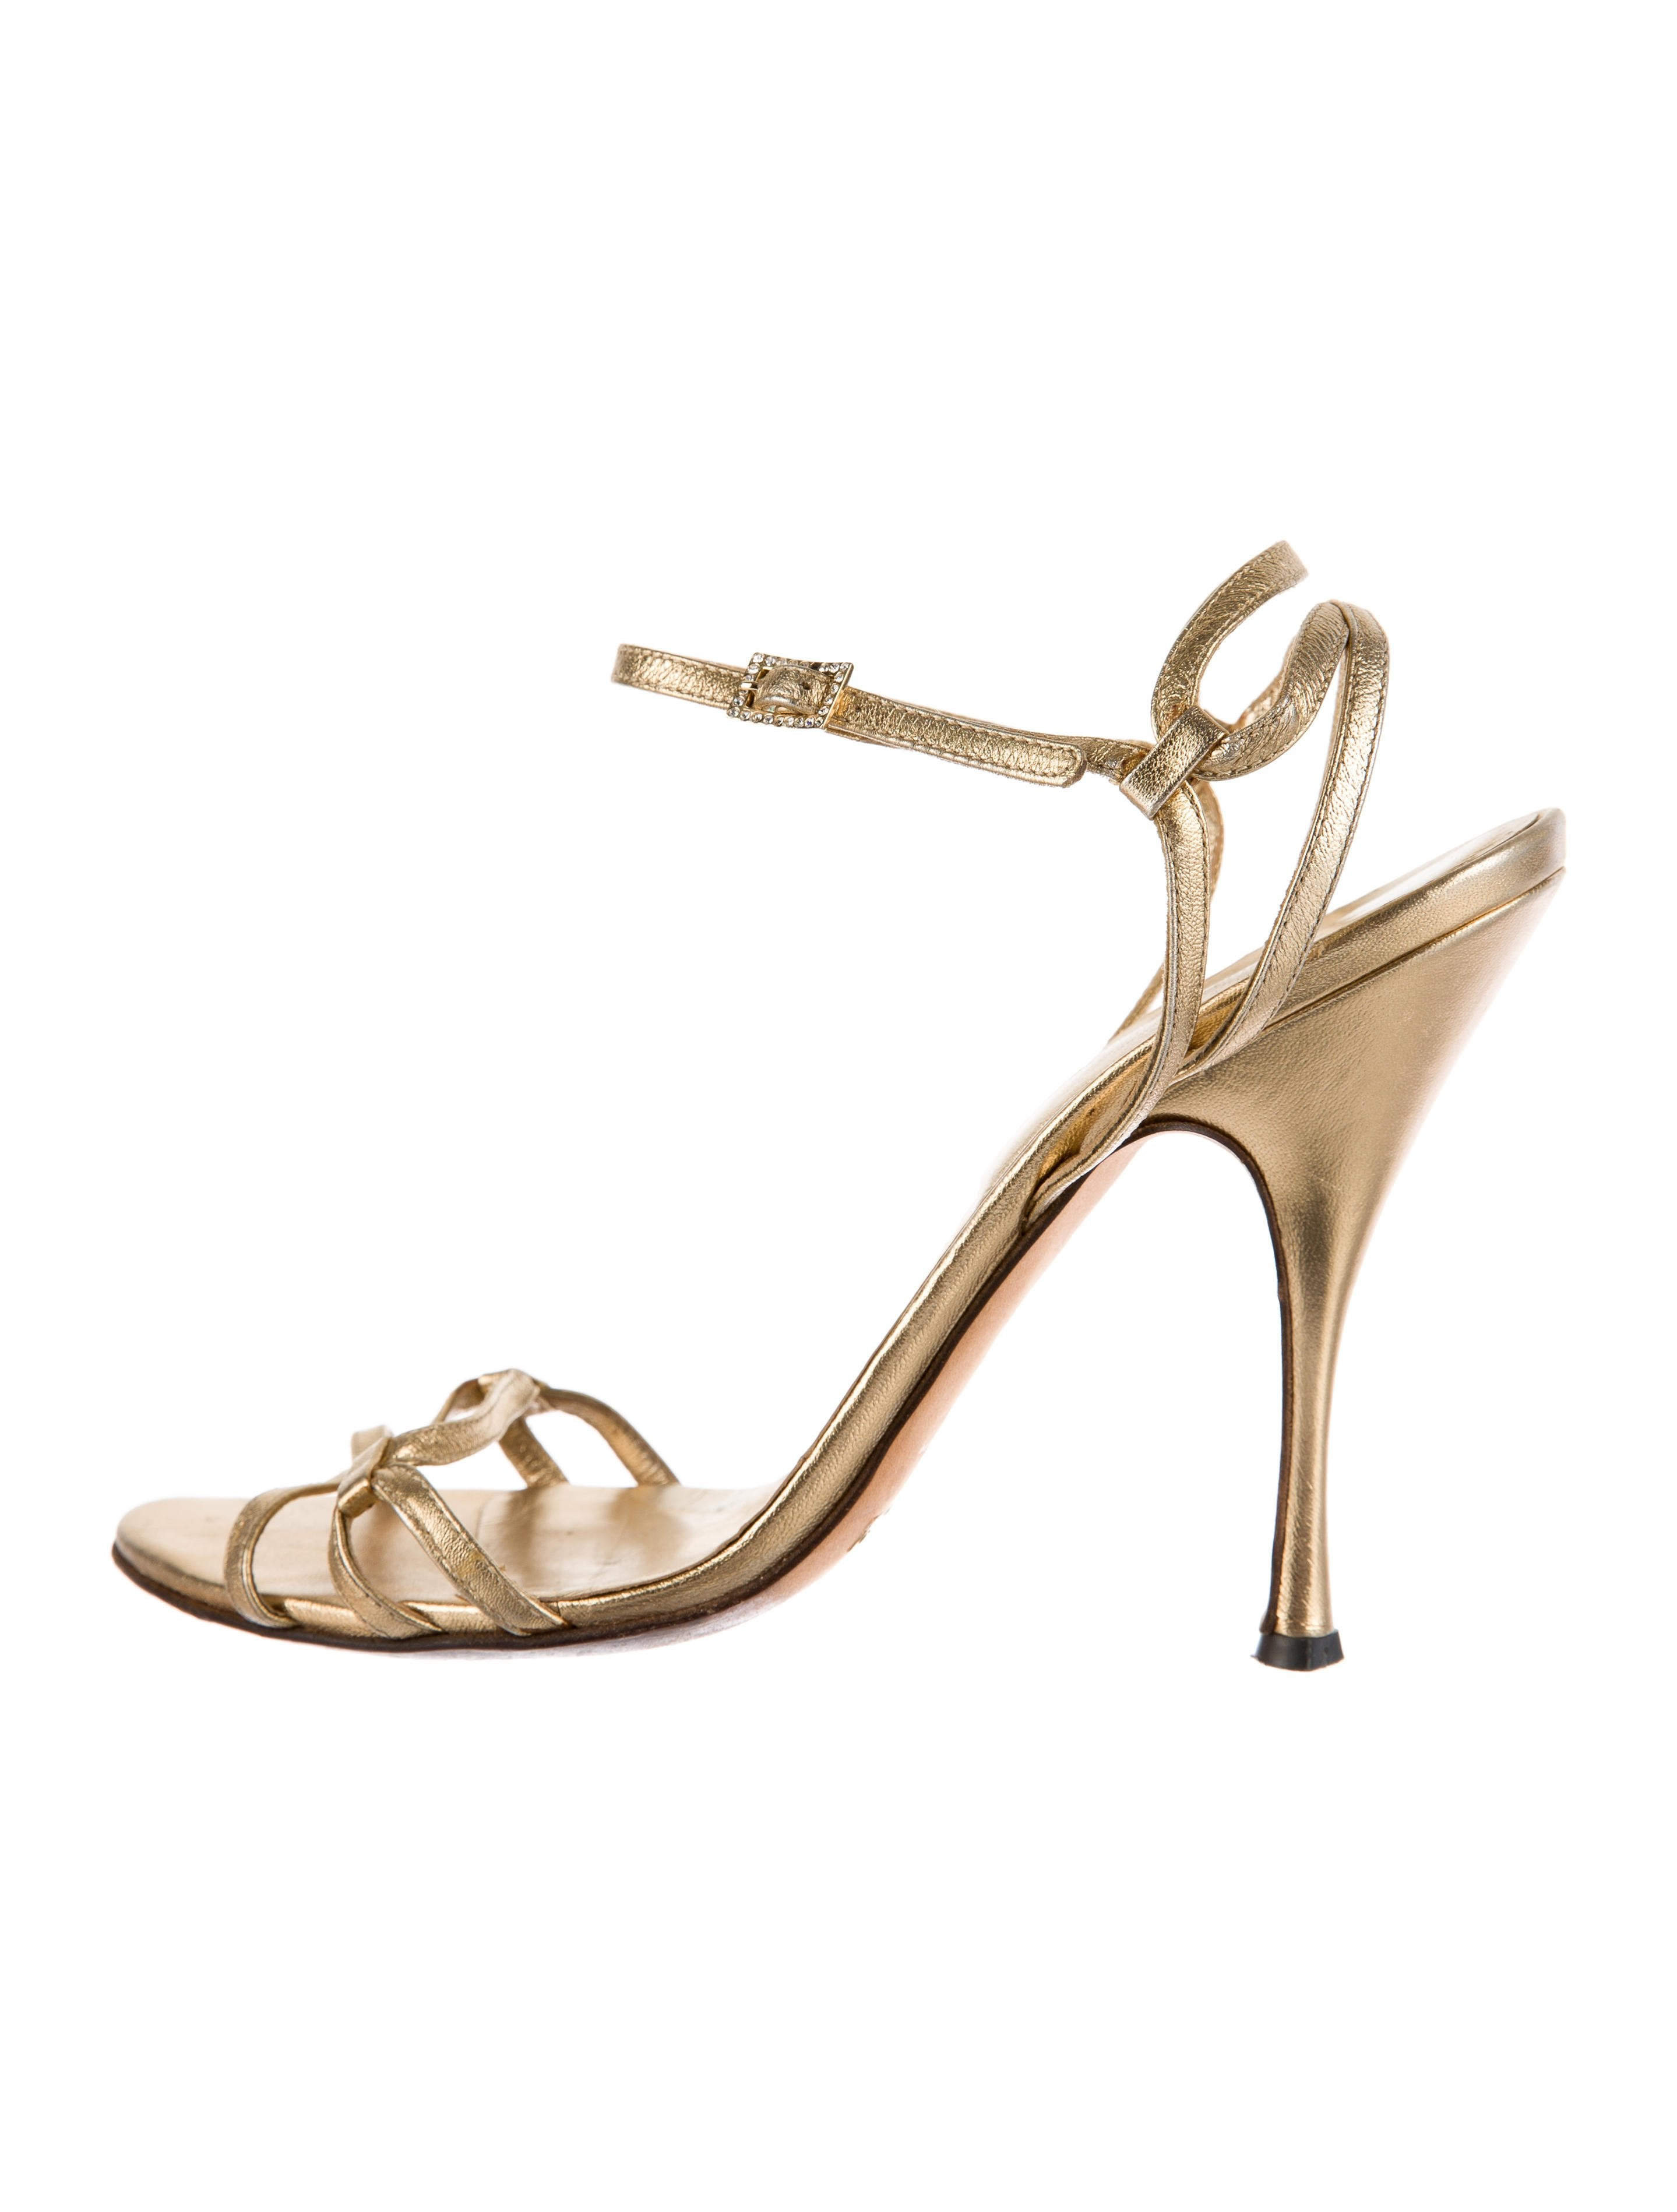 aff902669e22 Dolce   Gabbana Metallic Leather Sandals - Shoes - DAG95085